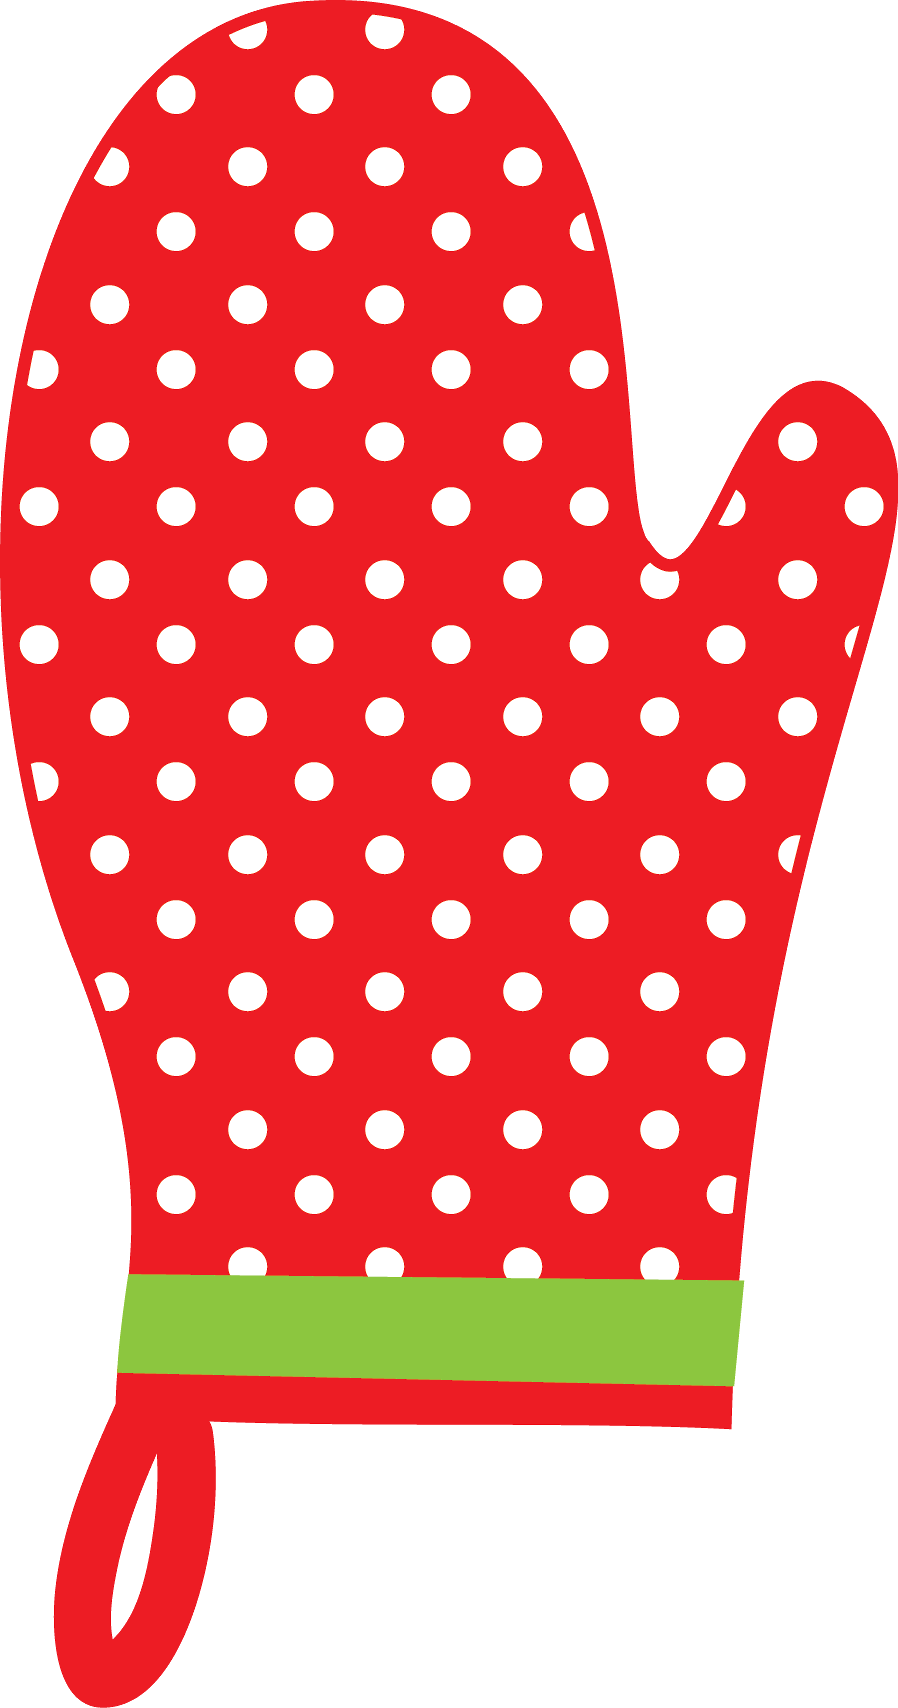 Free old workd book binder clipart svg free CHRISTMAS OVEN MITT CLIP ART   Navidad   Pinterest   Clip art, Food ... svg free